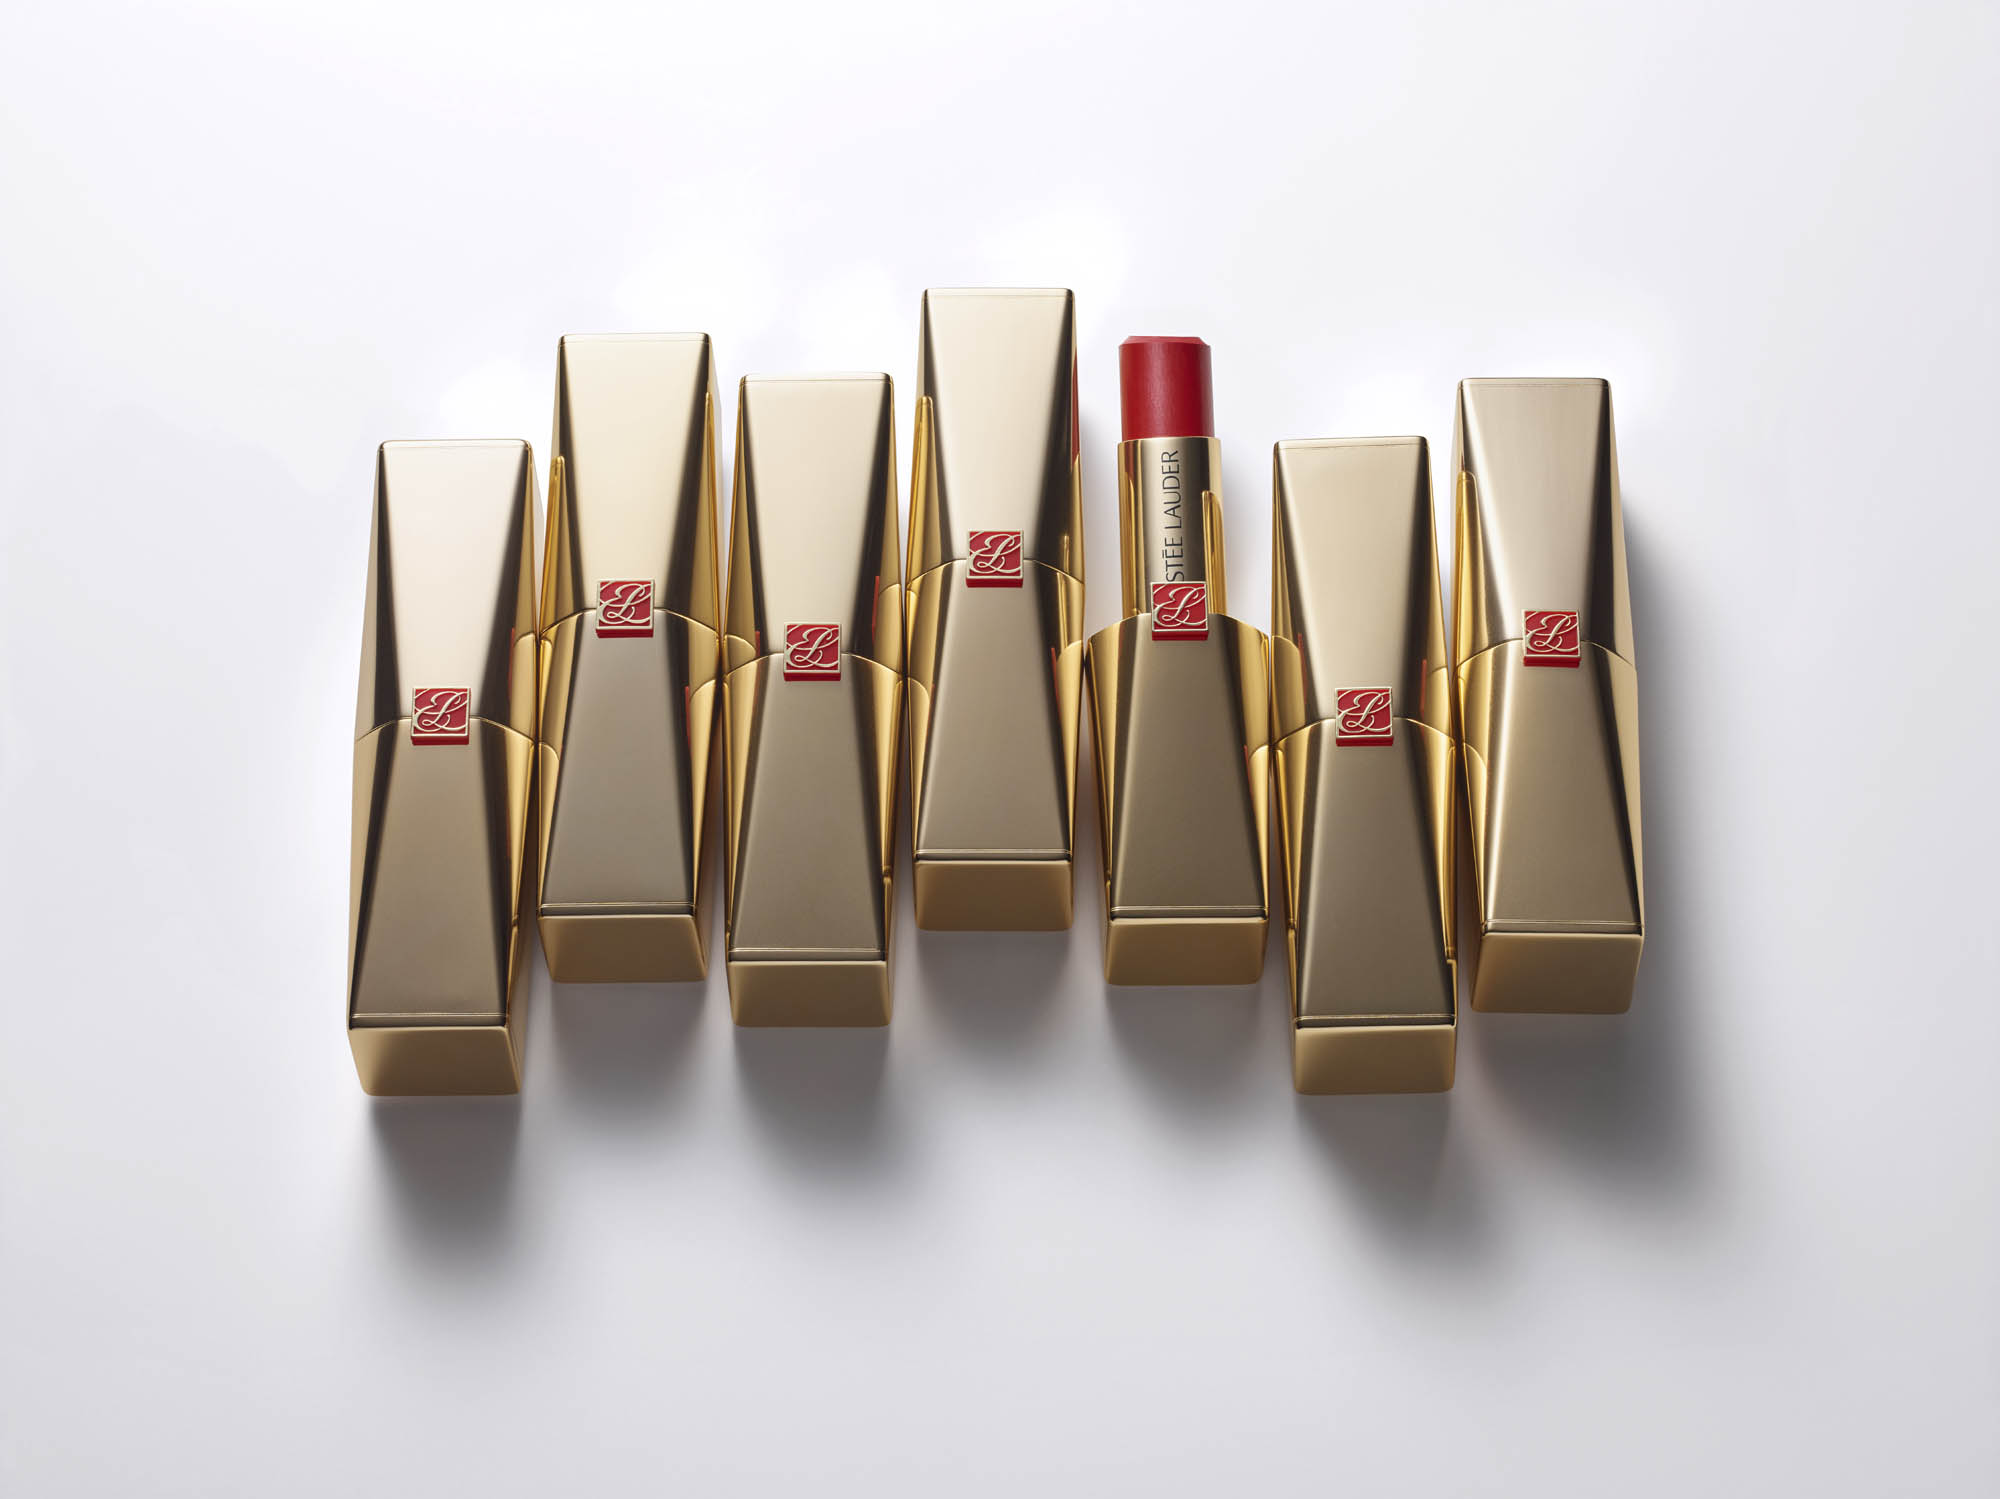 SSLPJ001515.01_ECCOMERCE_FOUNDATION_LIP_Lipstick_hero_category_01_F1B.jpg